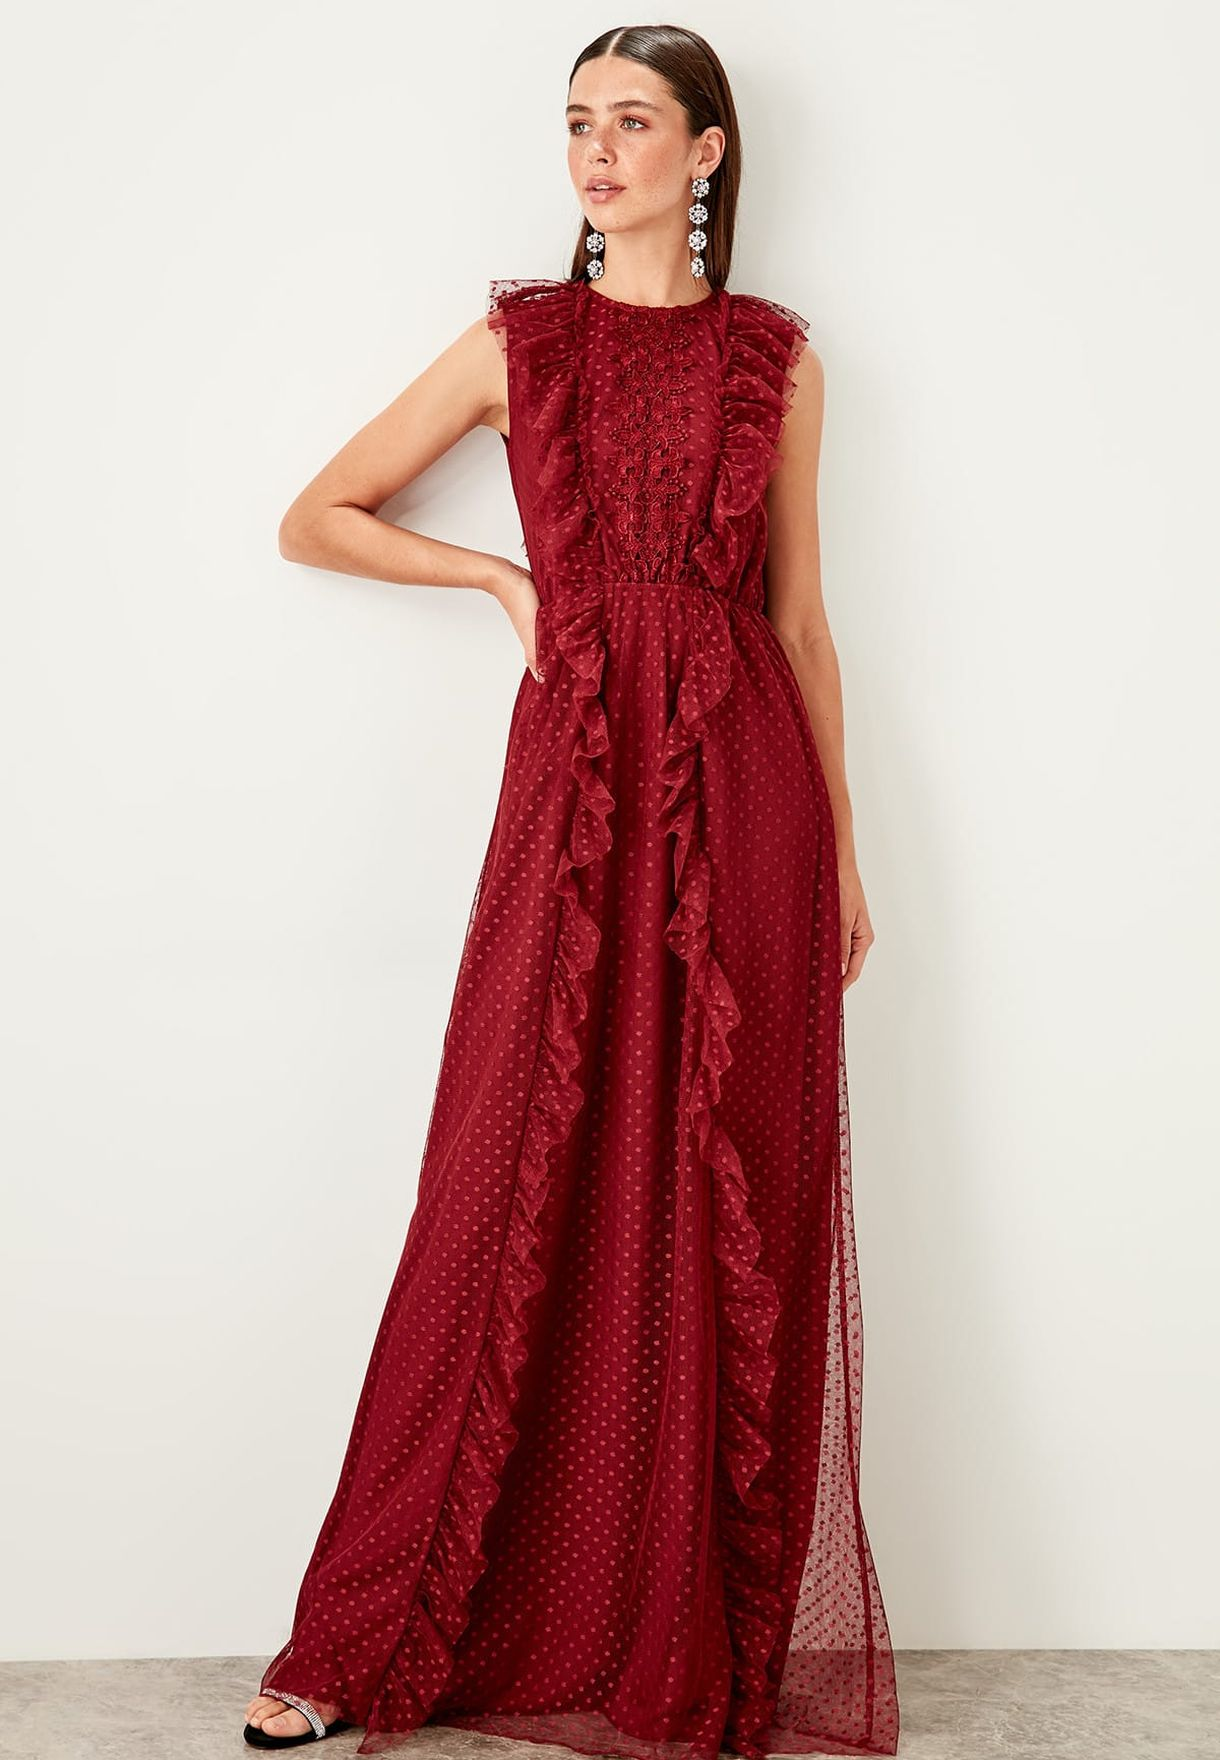 Ruffle Detail Polka Dot Dress